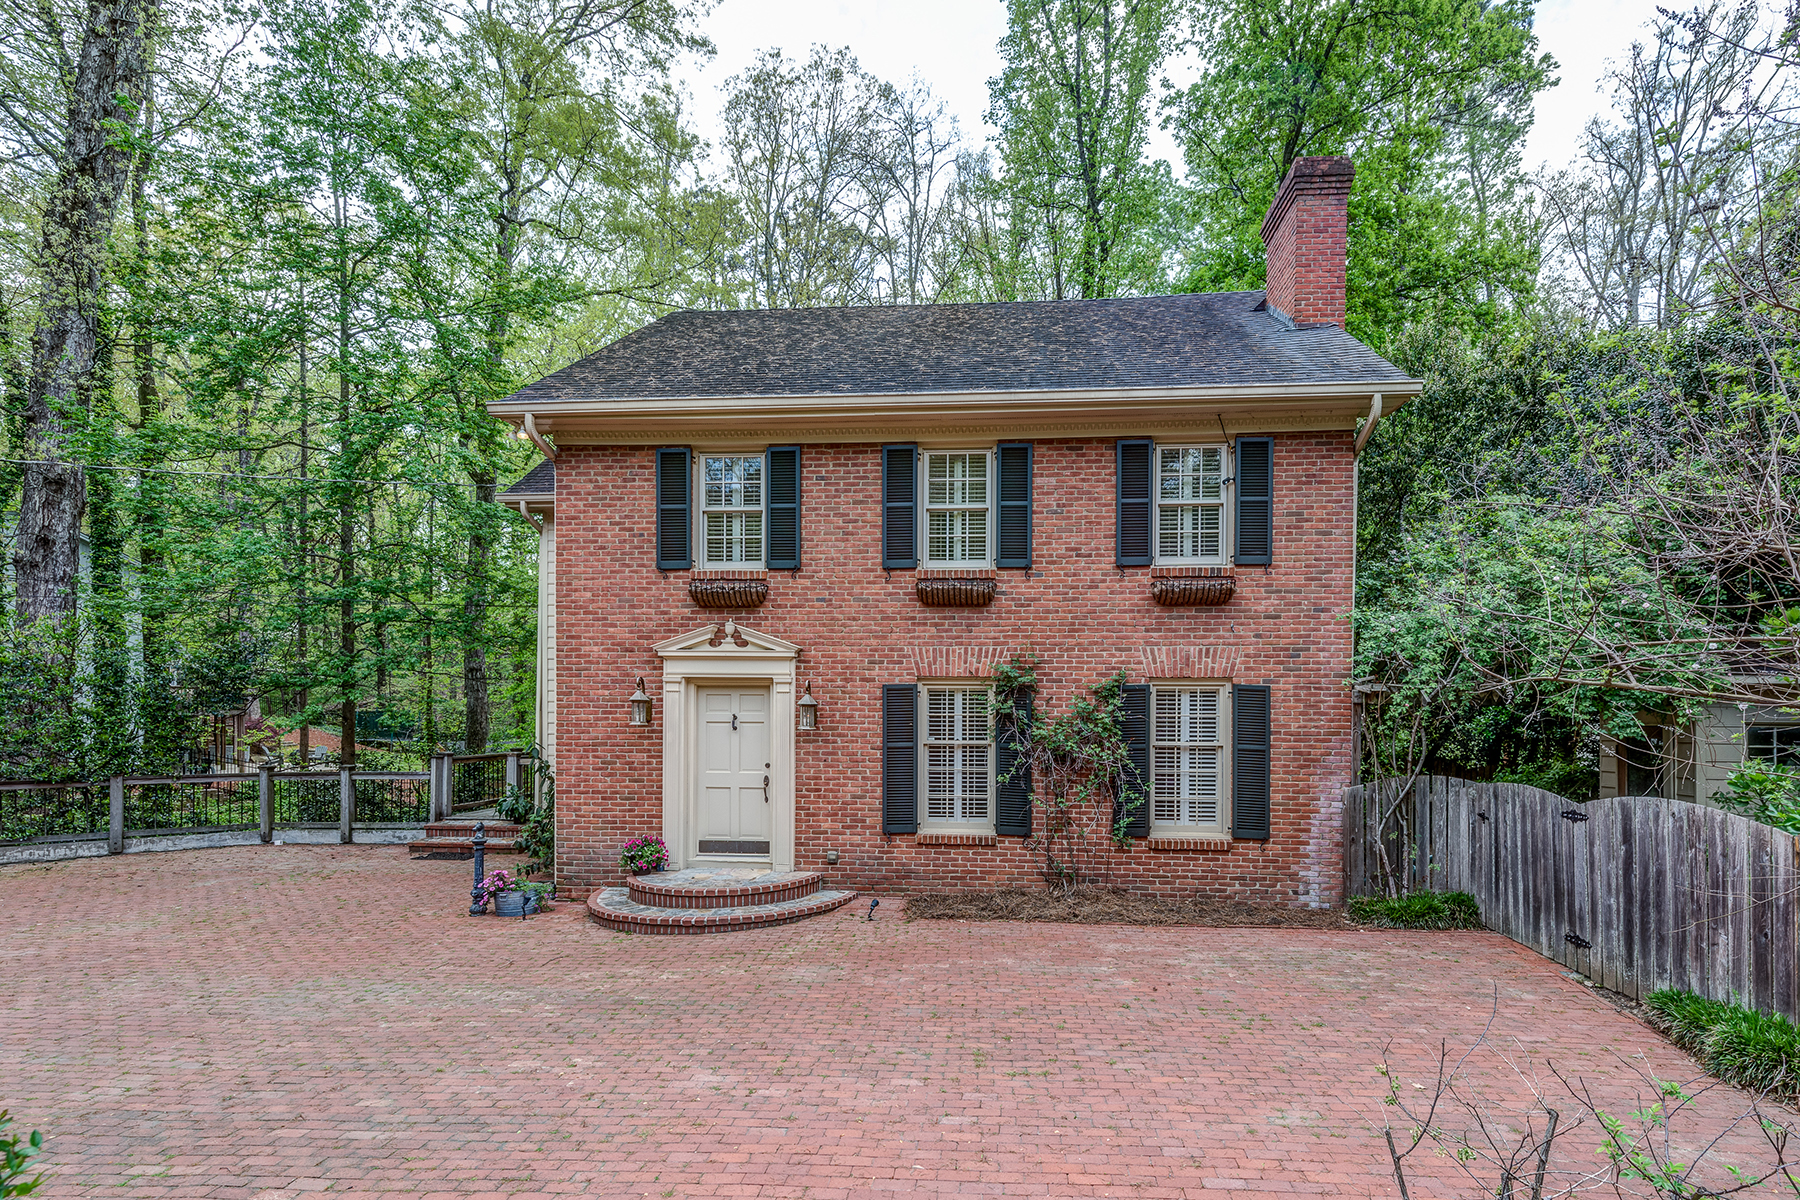 Single Family Home for Sale at A Hidden Branches Gem 5137 Hidden Branches Cir Atlanta, Georgia 30338 United States